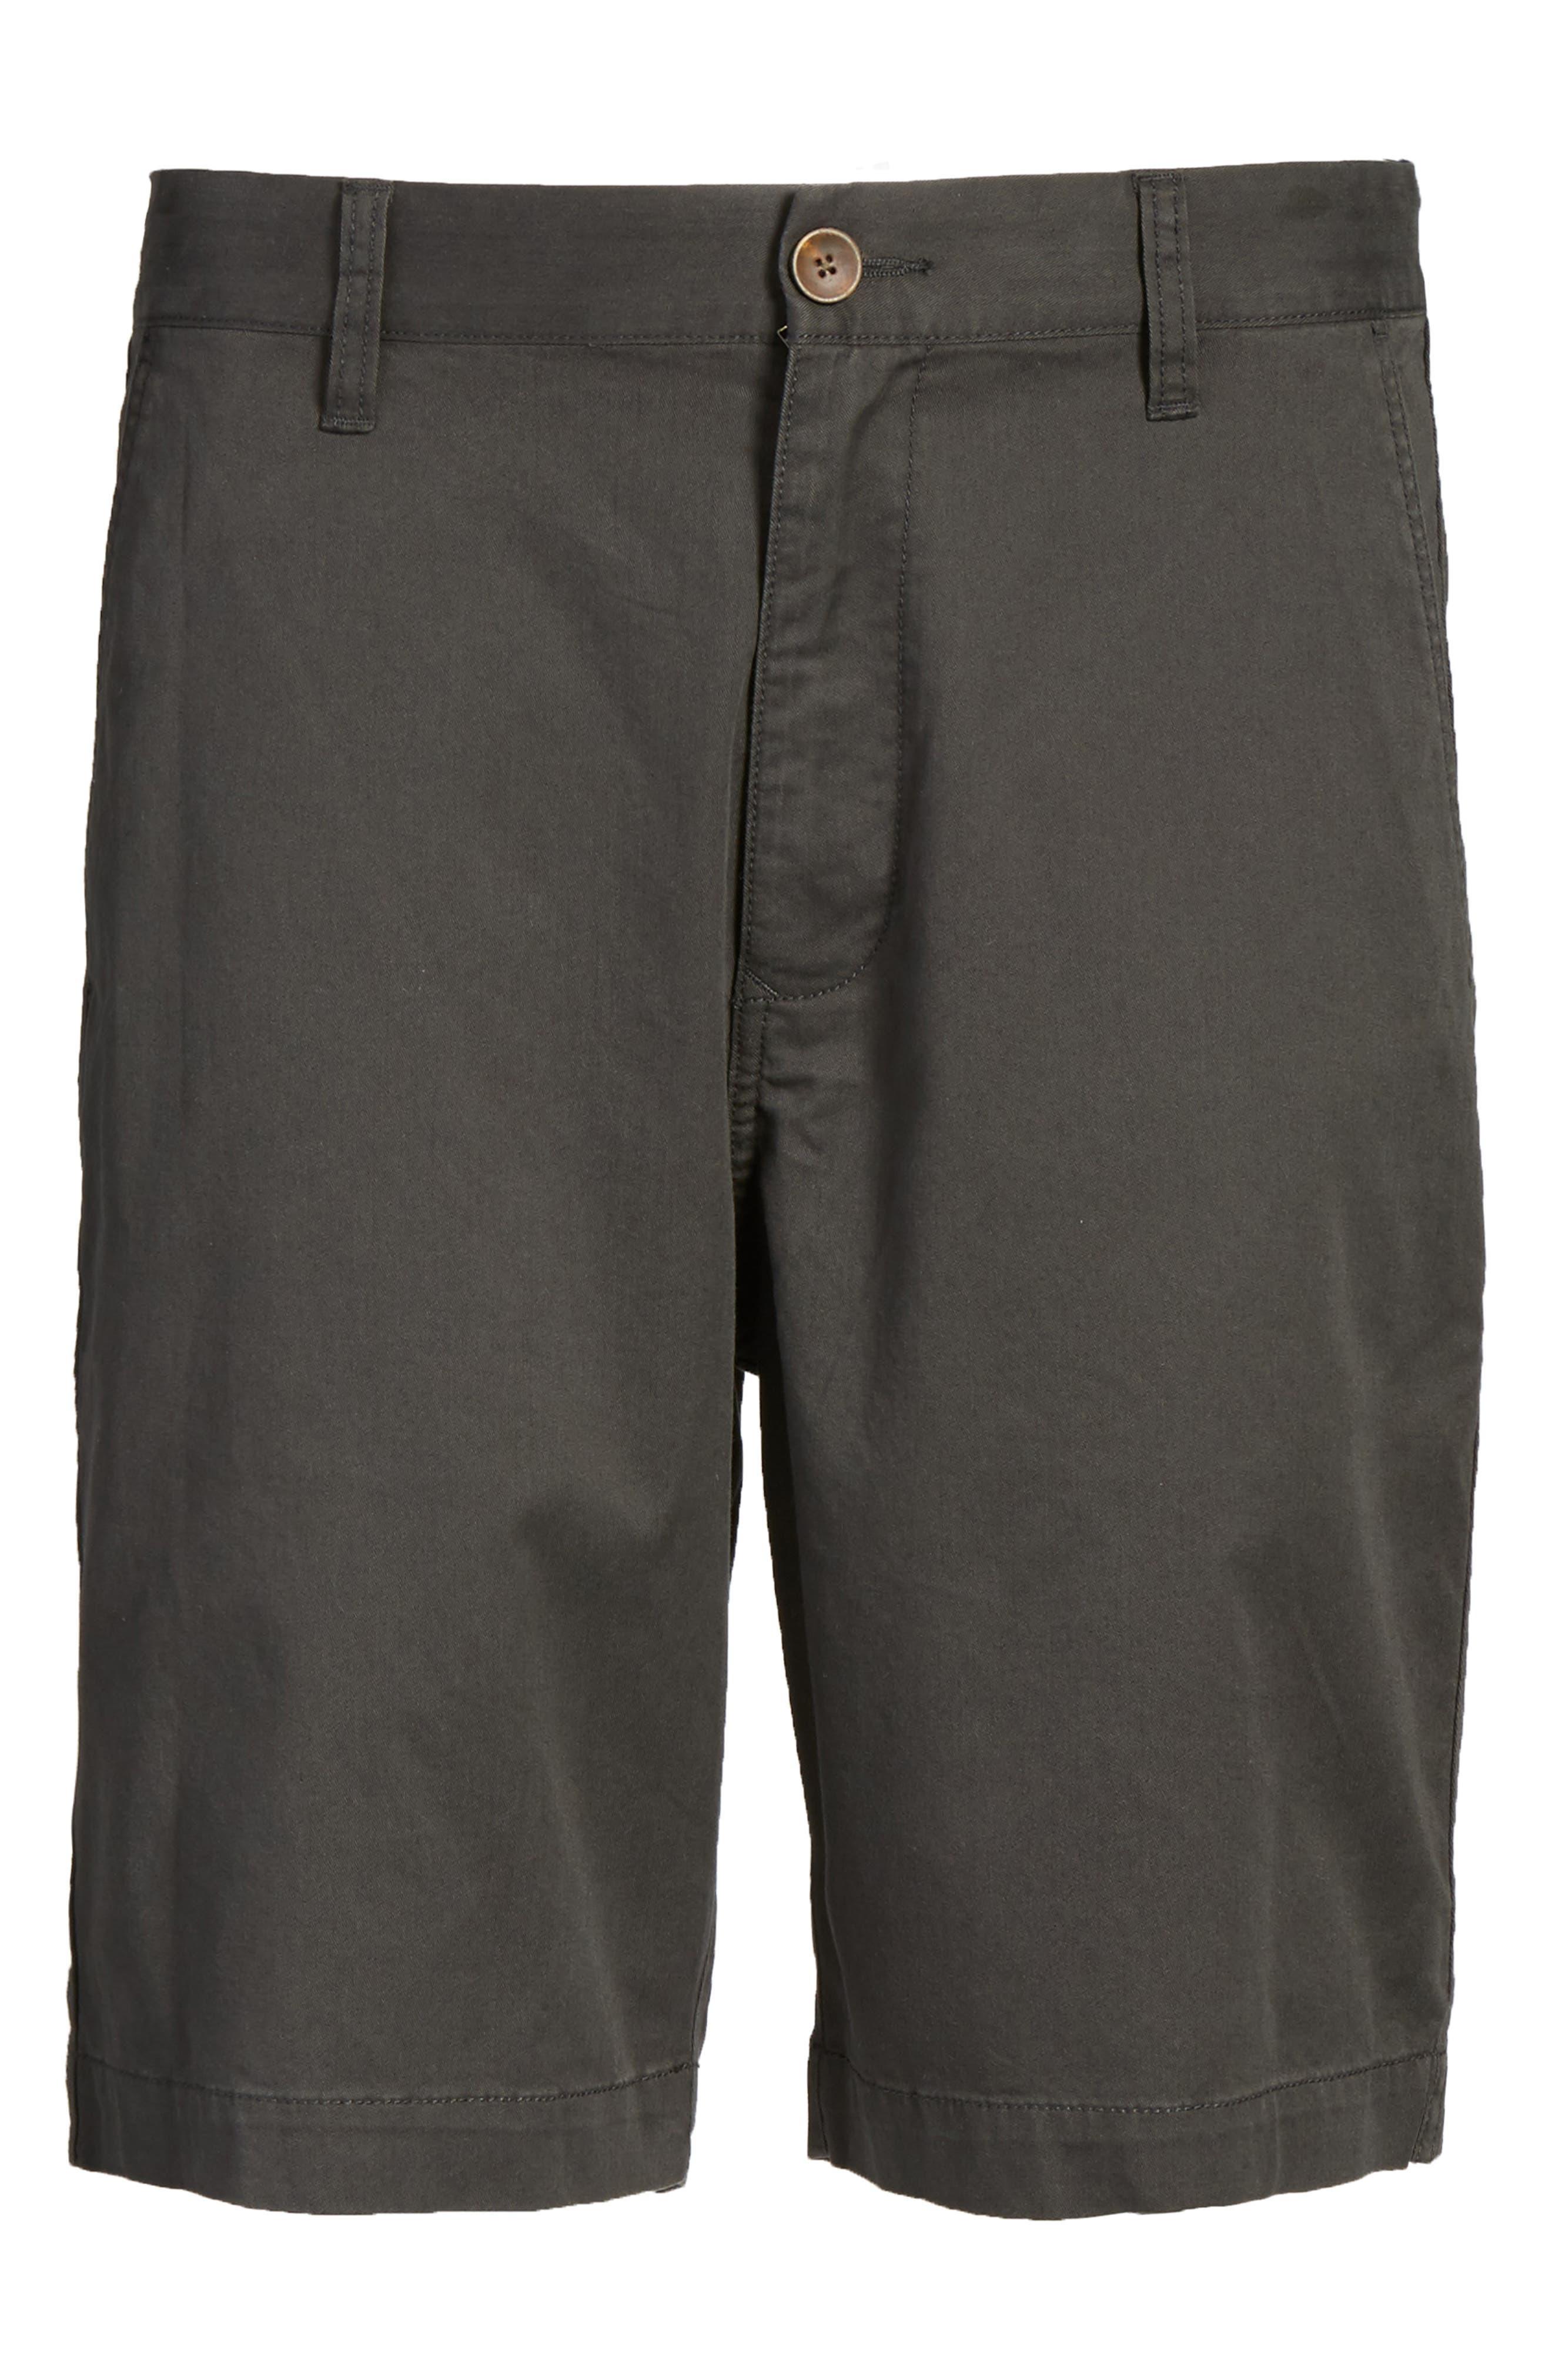 Bolderwood Shorts,                             Alternate thumbnail 6, color,                             023